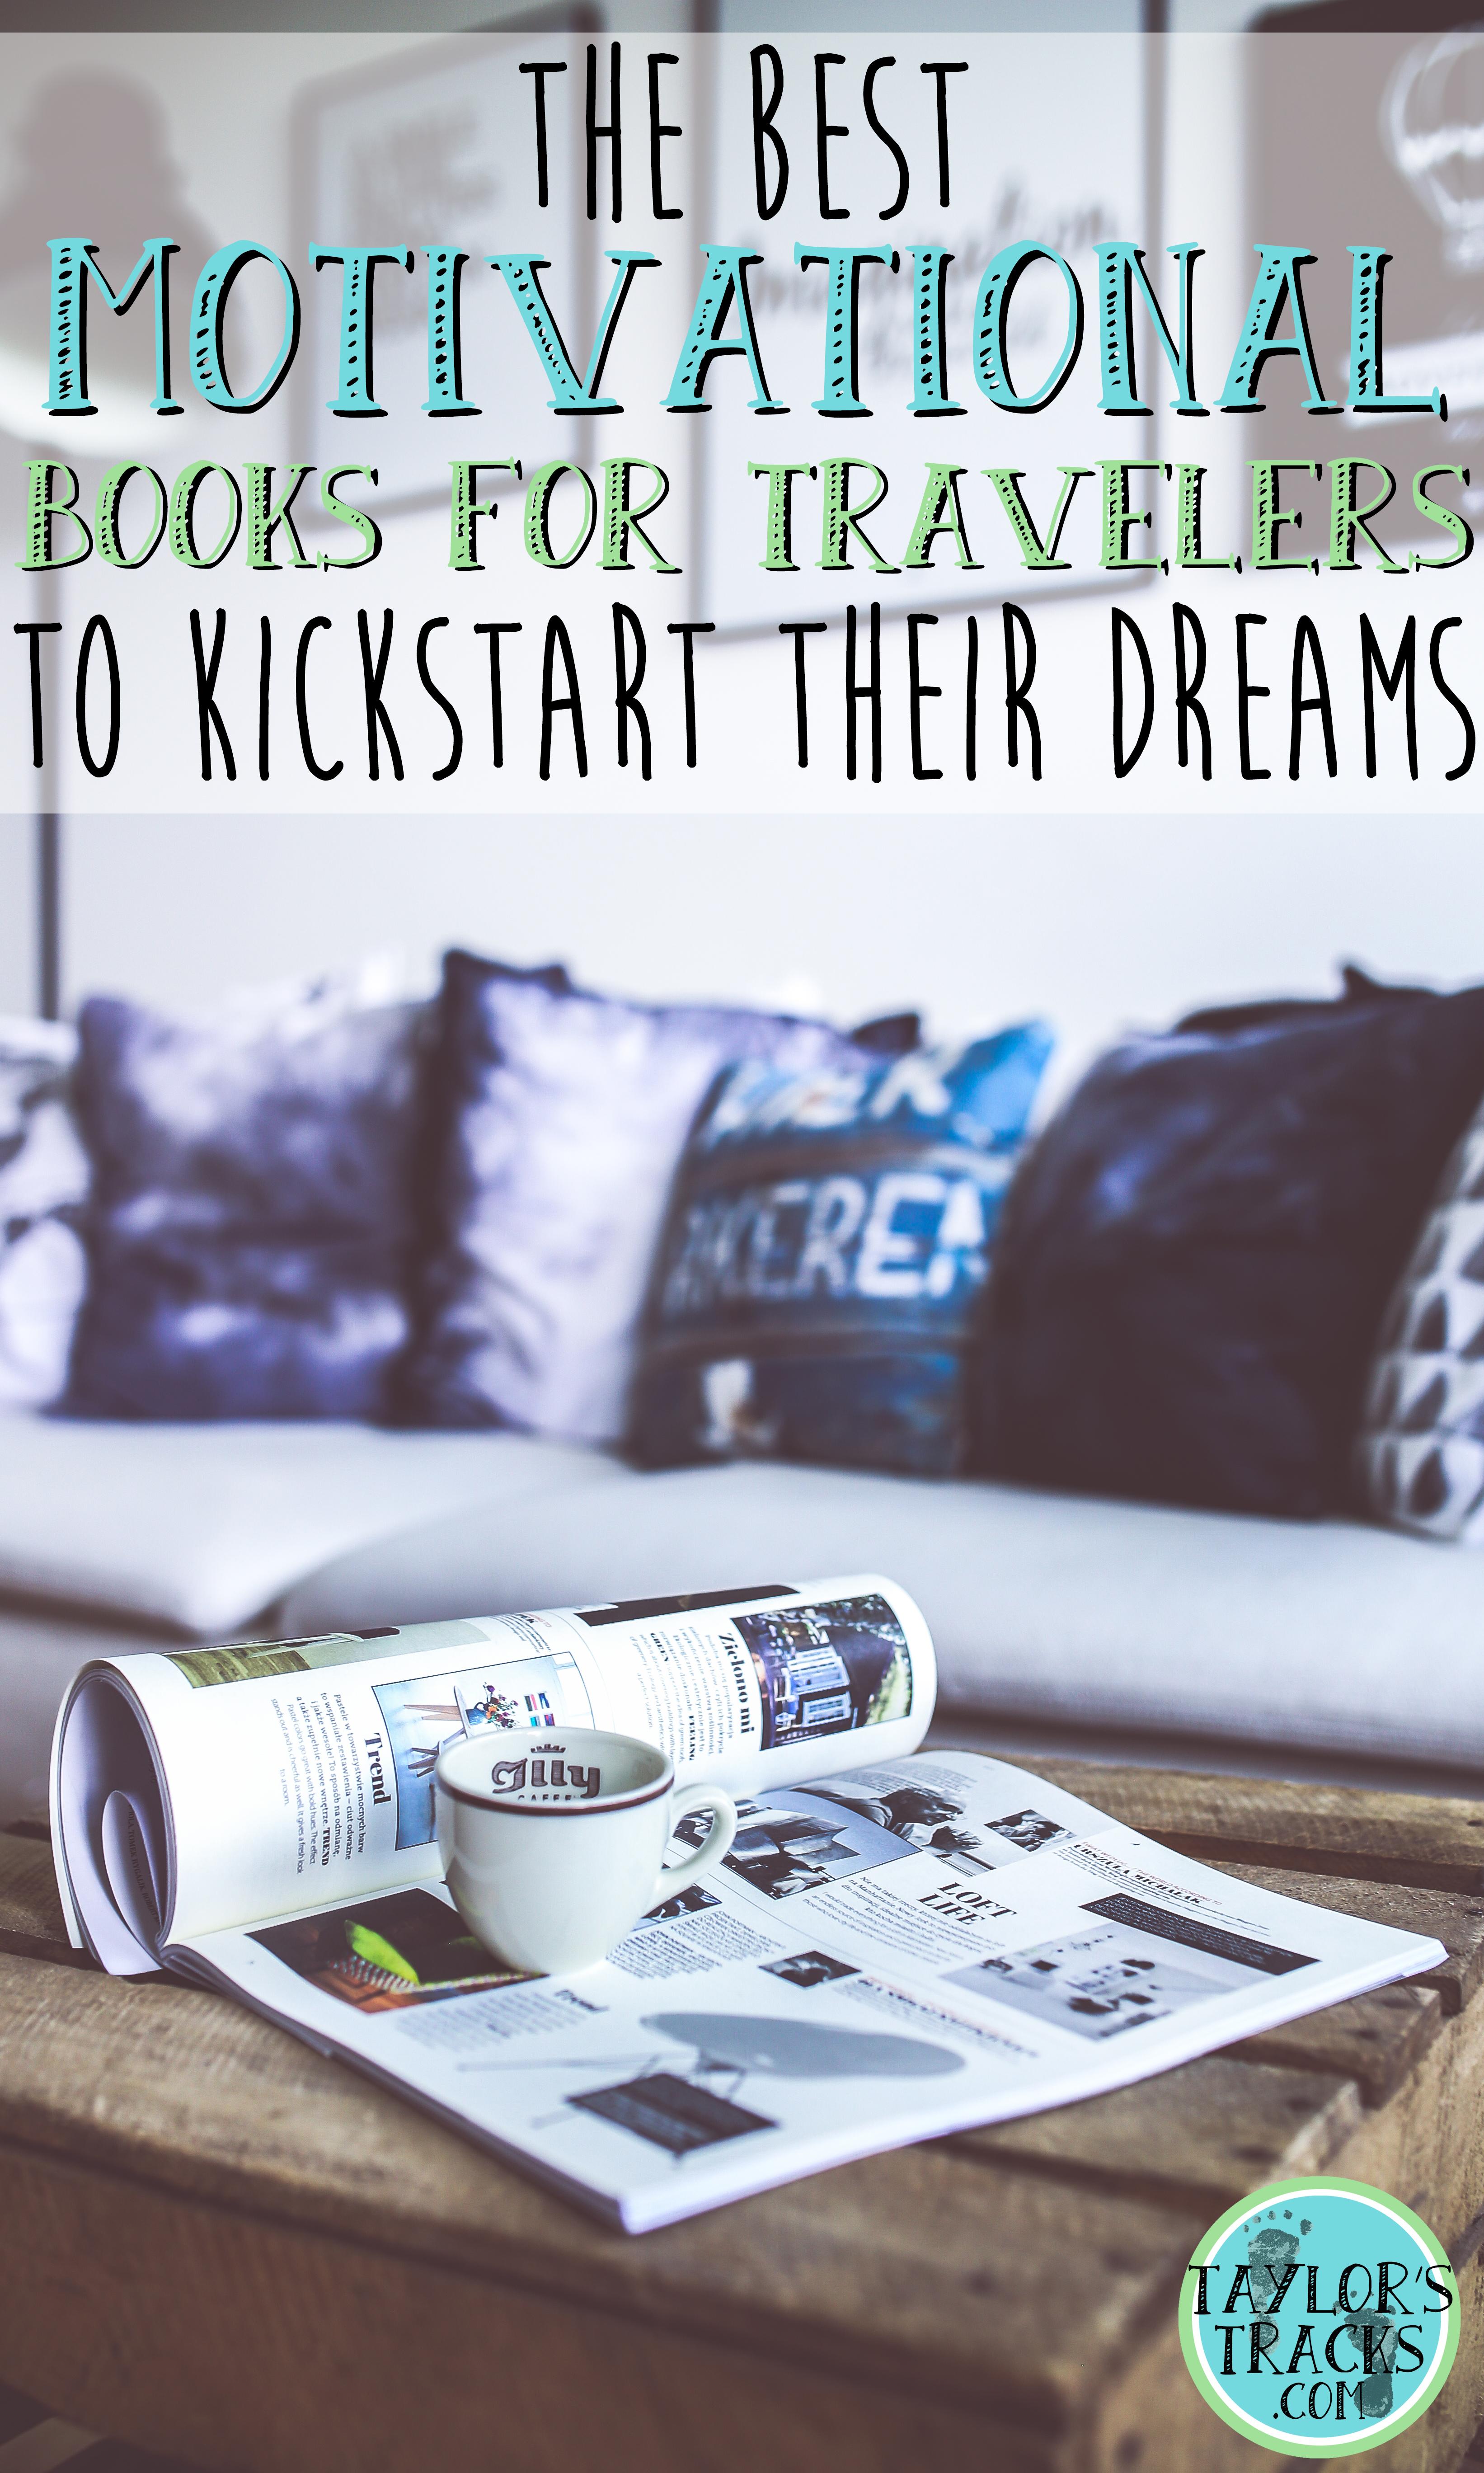 The Best Motivation Books for Travelers to Kickstart their Dreams www.taylorstracks.com